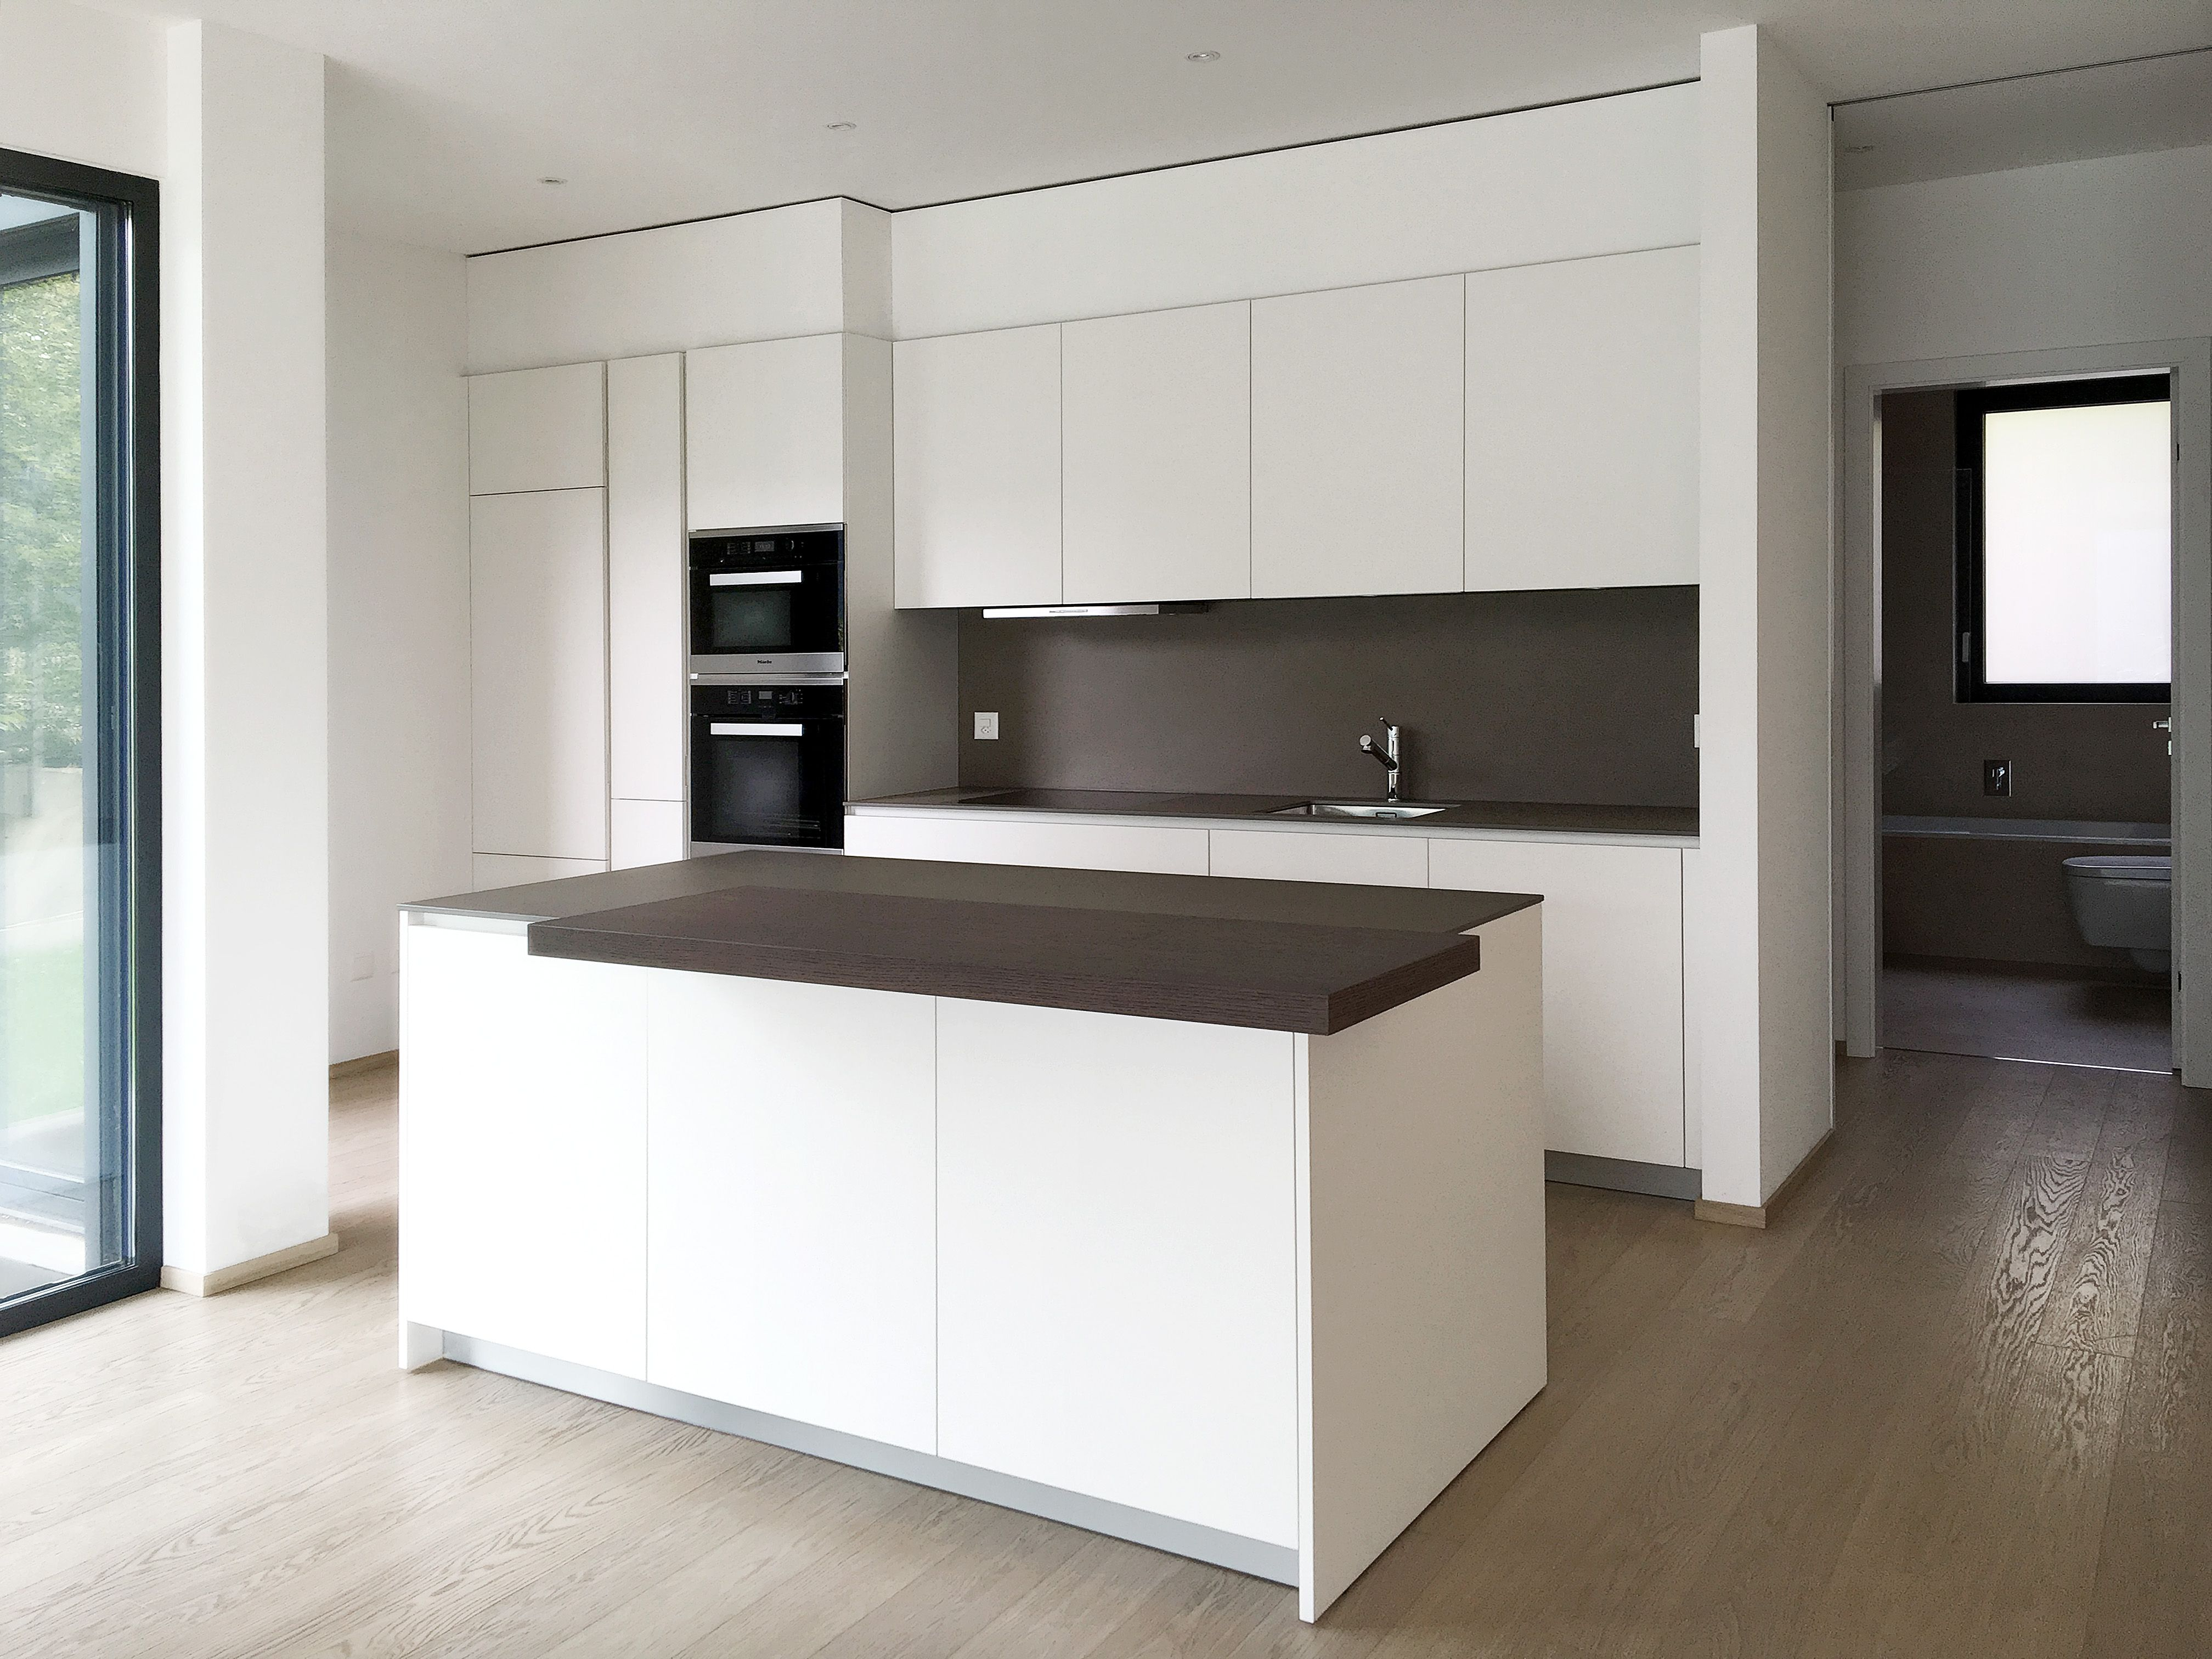 Varenna Küchen ~ Cucina design varenna poliform laccata bianca con piano in ceramica